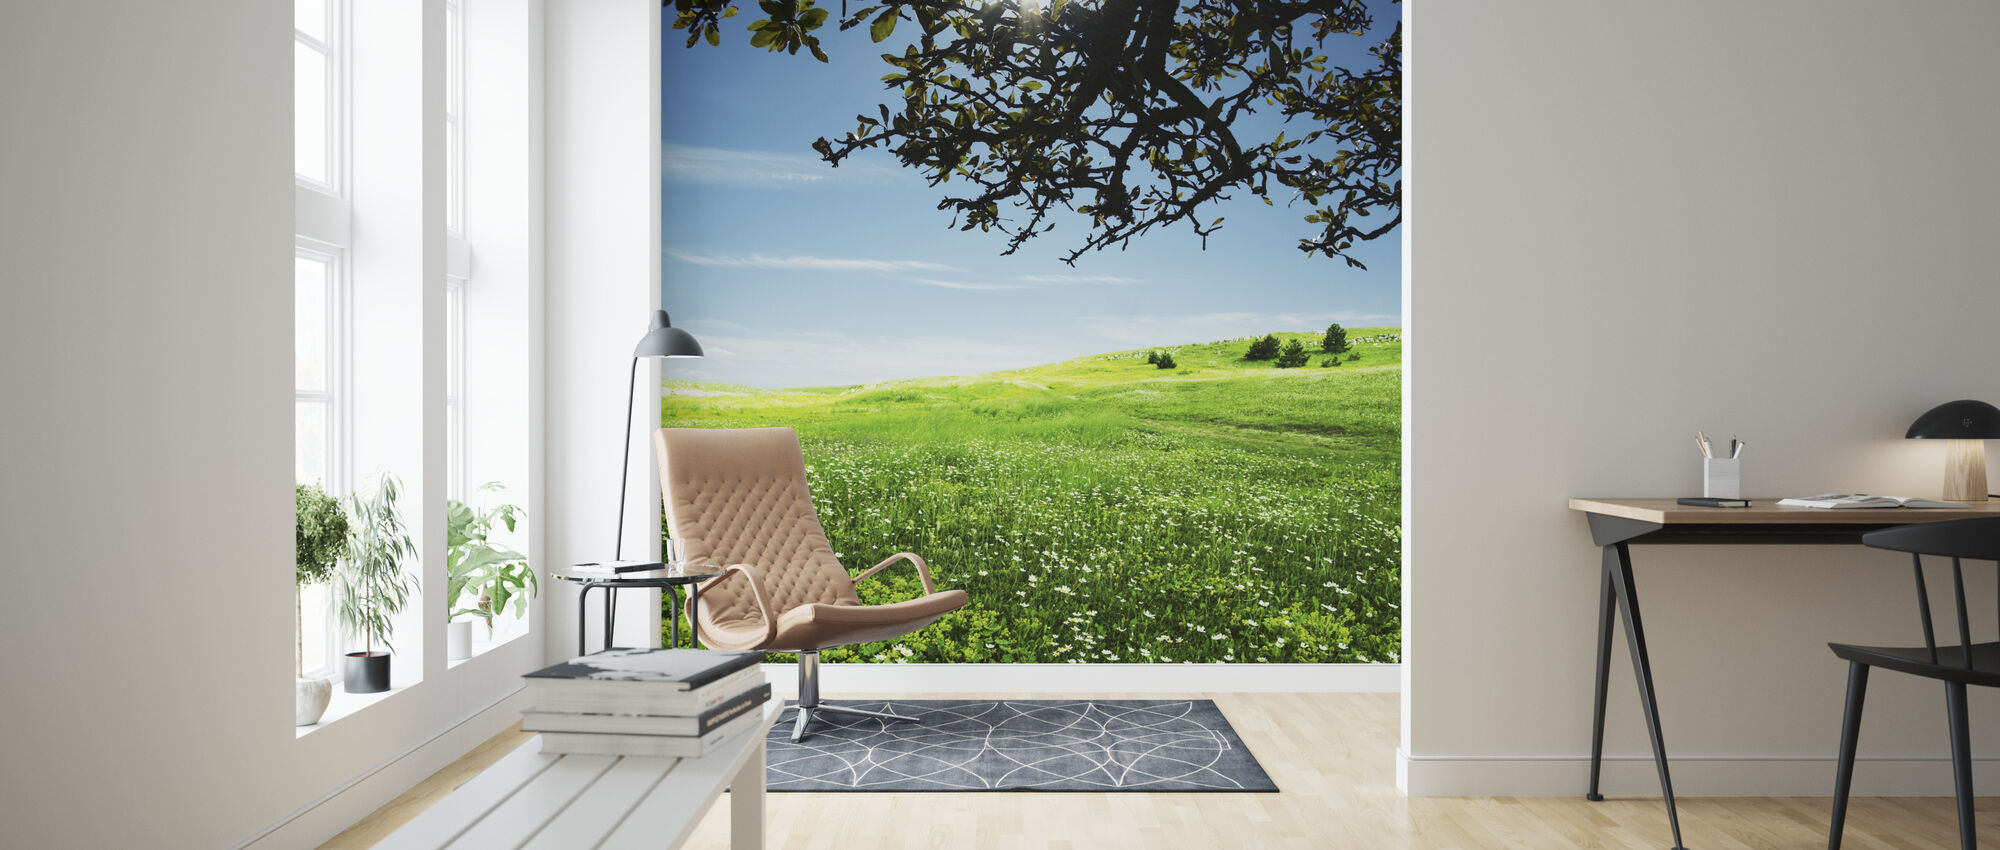 Green Meadow - Wallpaper - Living Room